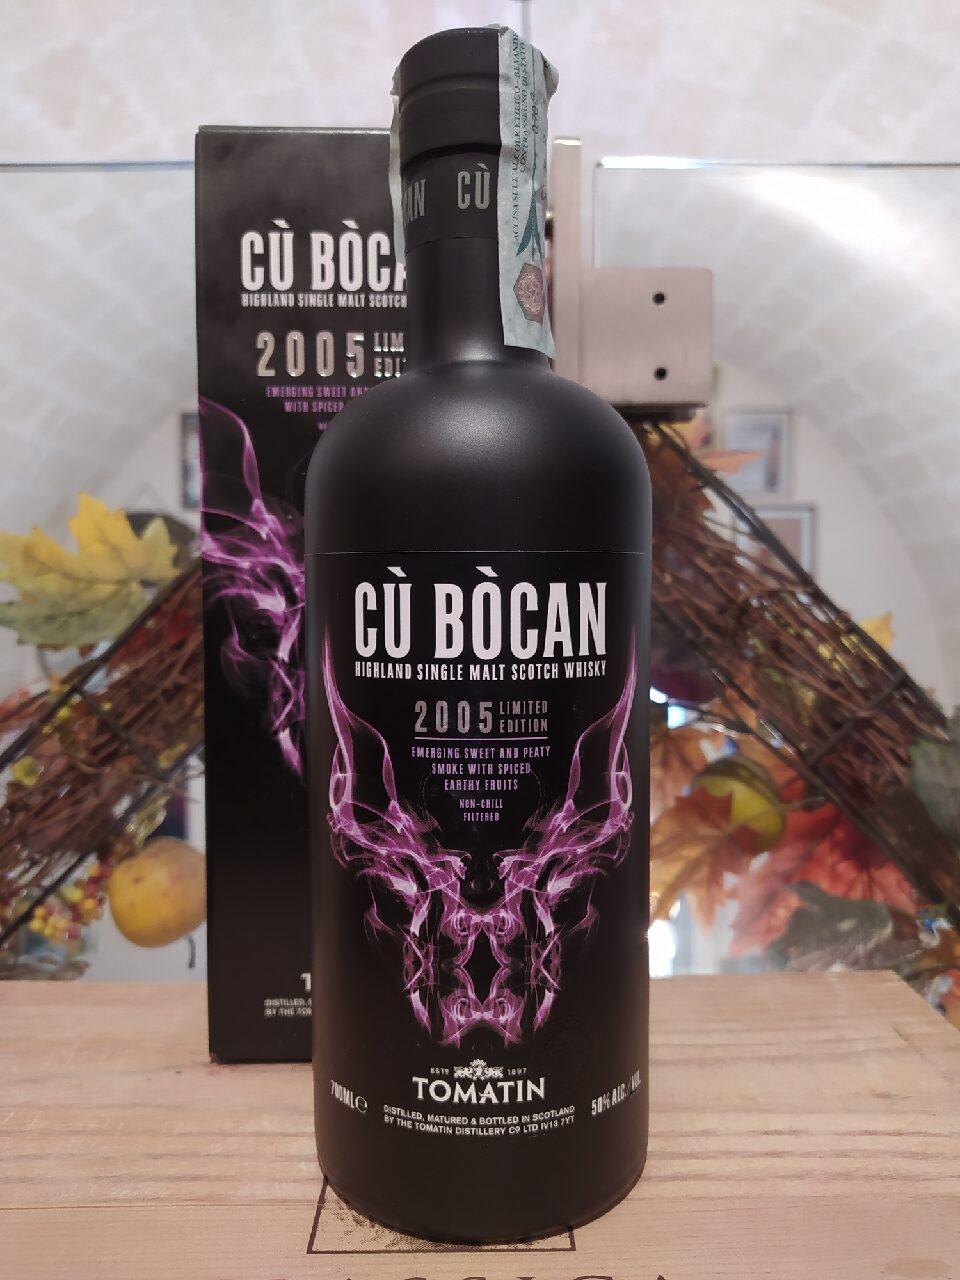 Cù Bòcan Highland Single Malt Scotch Whisky 2005 11 YO Vintage Limited Edition